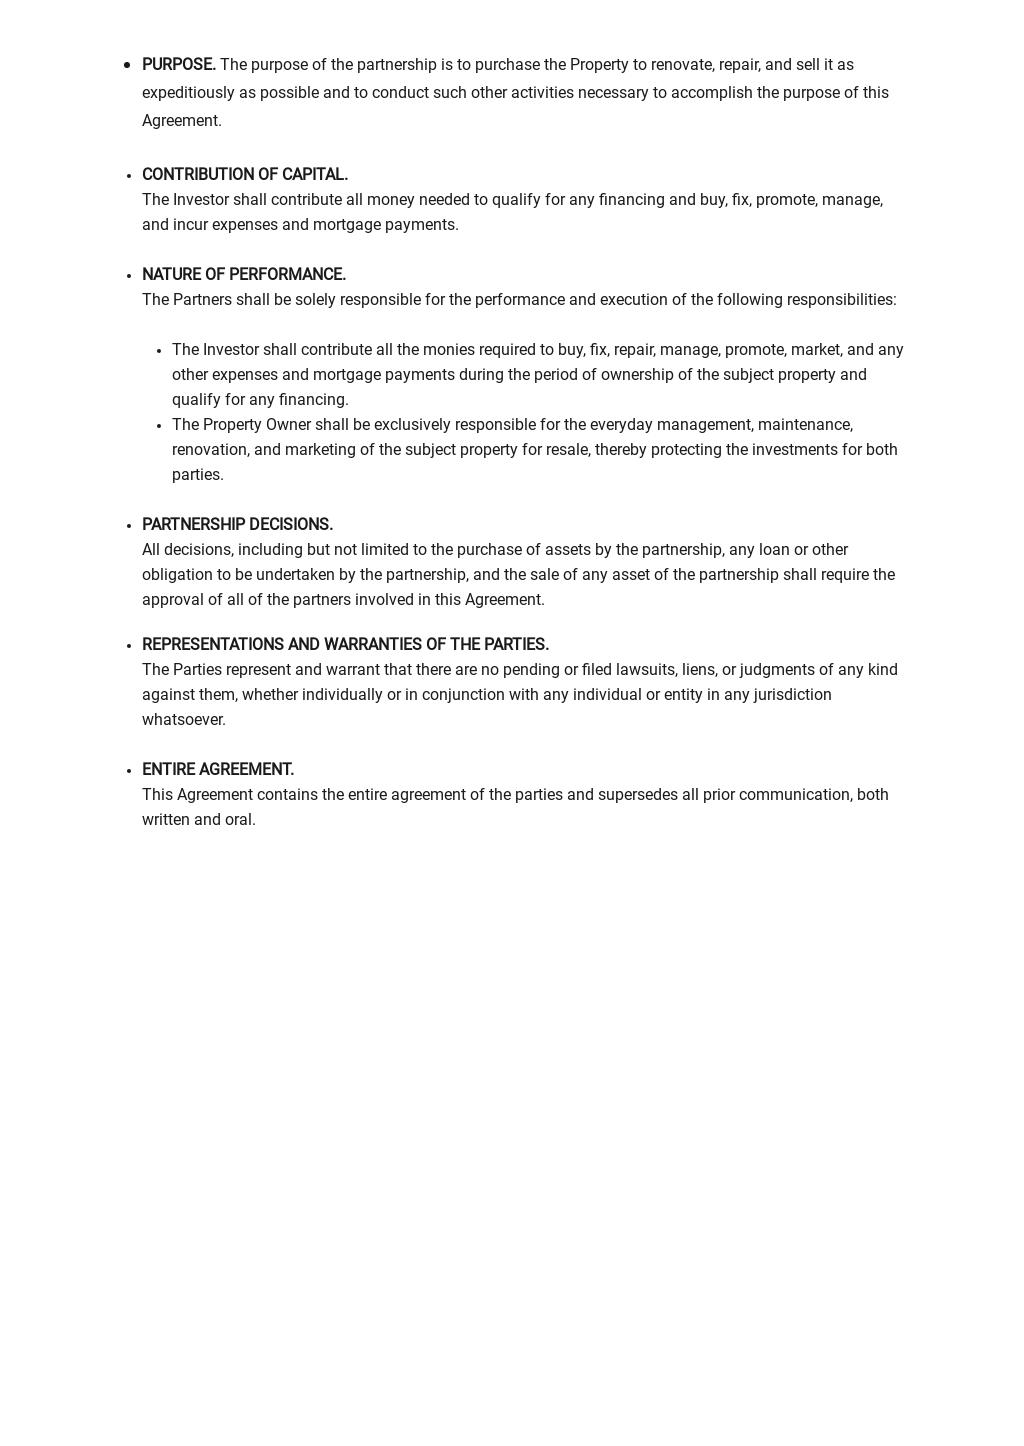 Real Estate Partnership Agreement Template 2.jpe